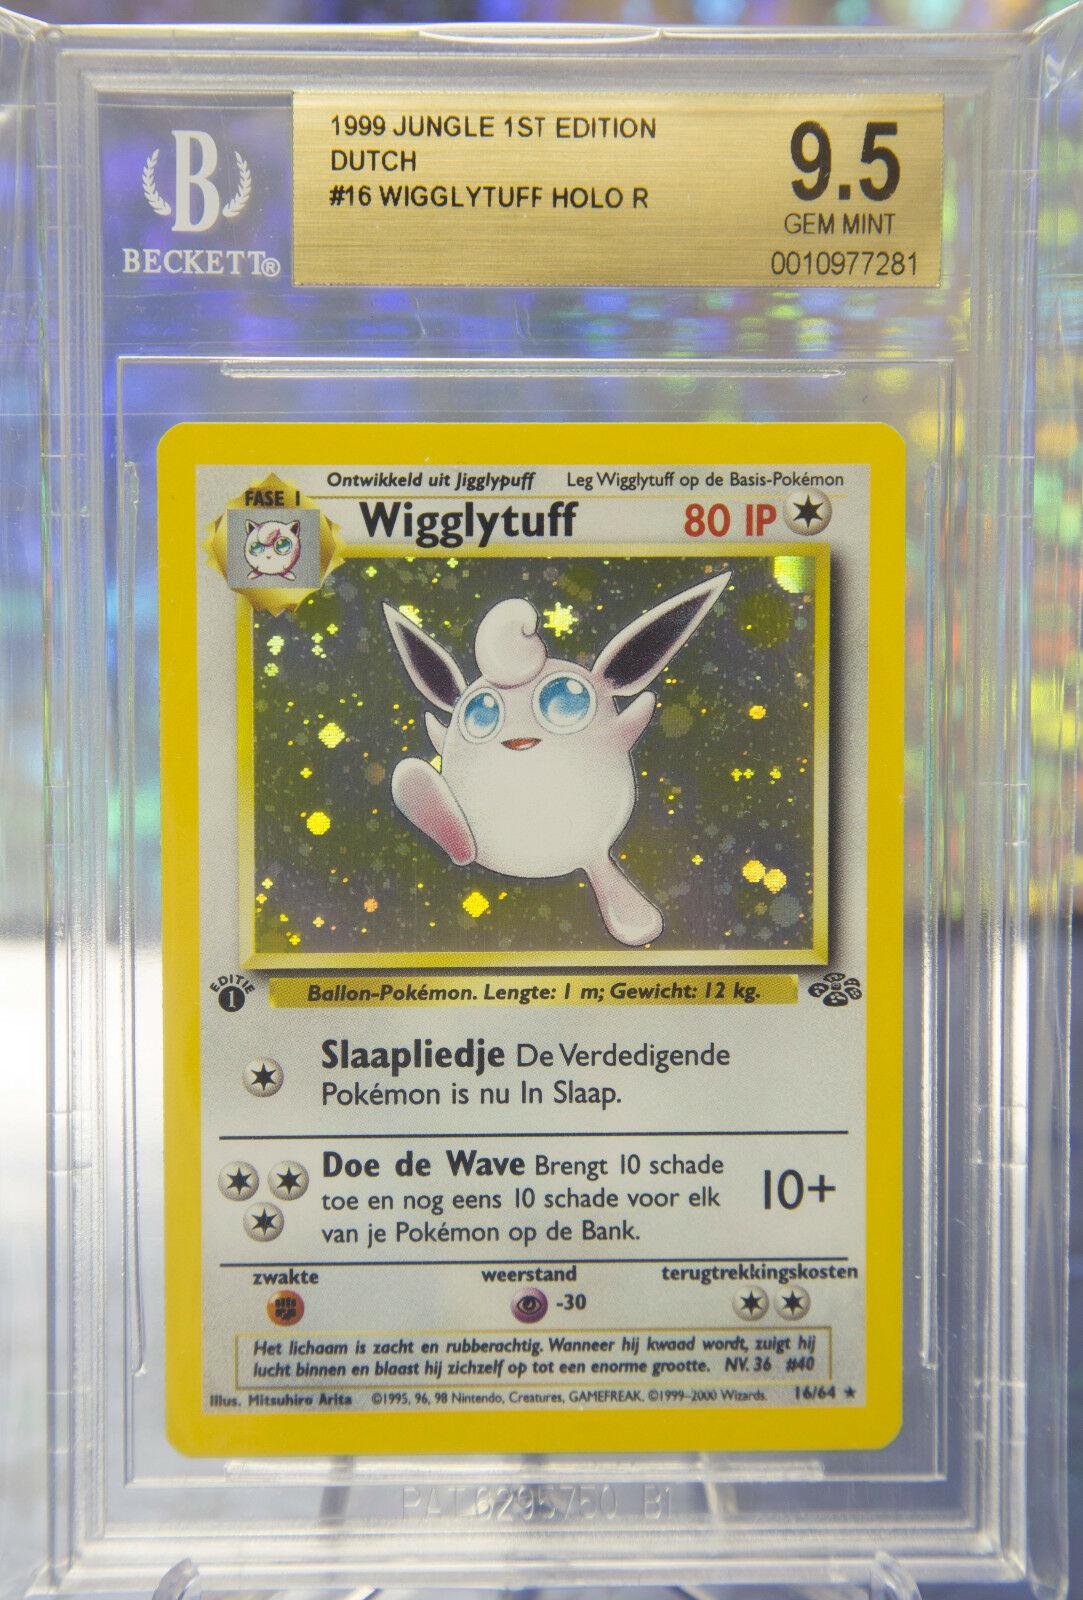 POP 1 DUTCH 1st Edition Wigglytuff Gem Mint 95 Jungle Pokemon Card NL RARE